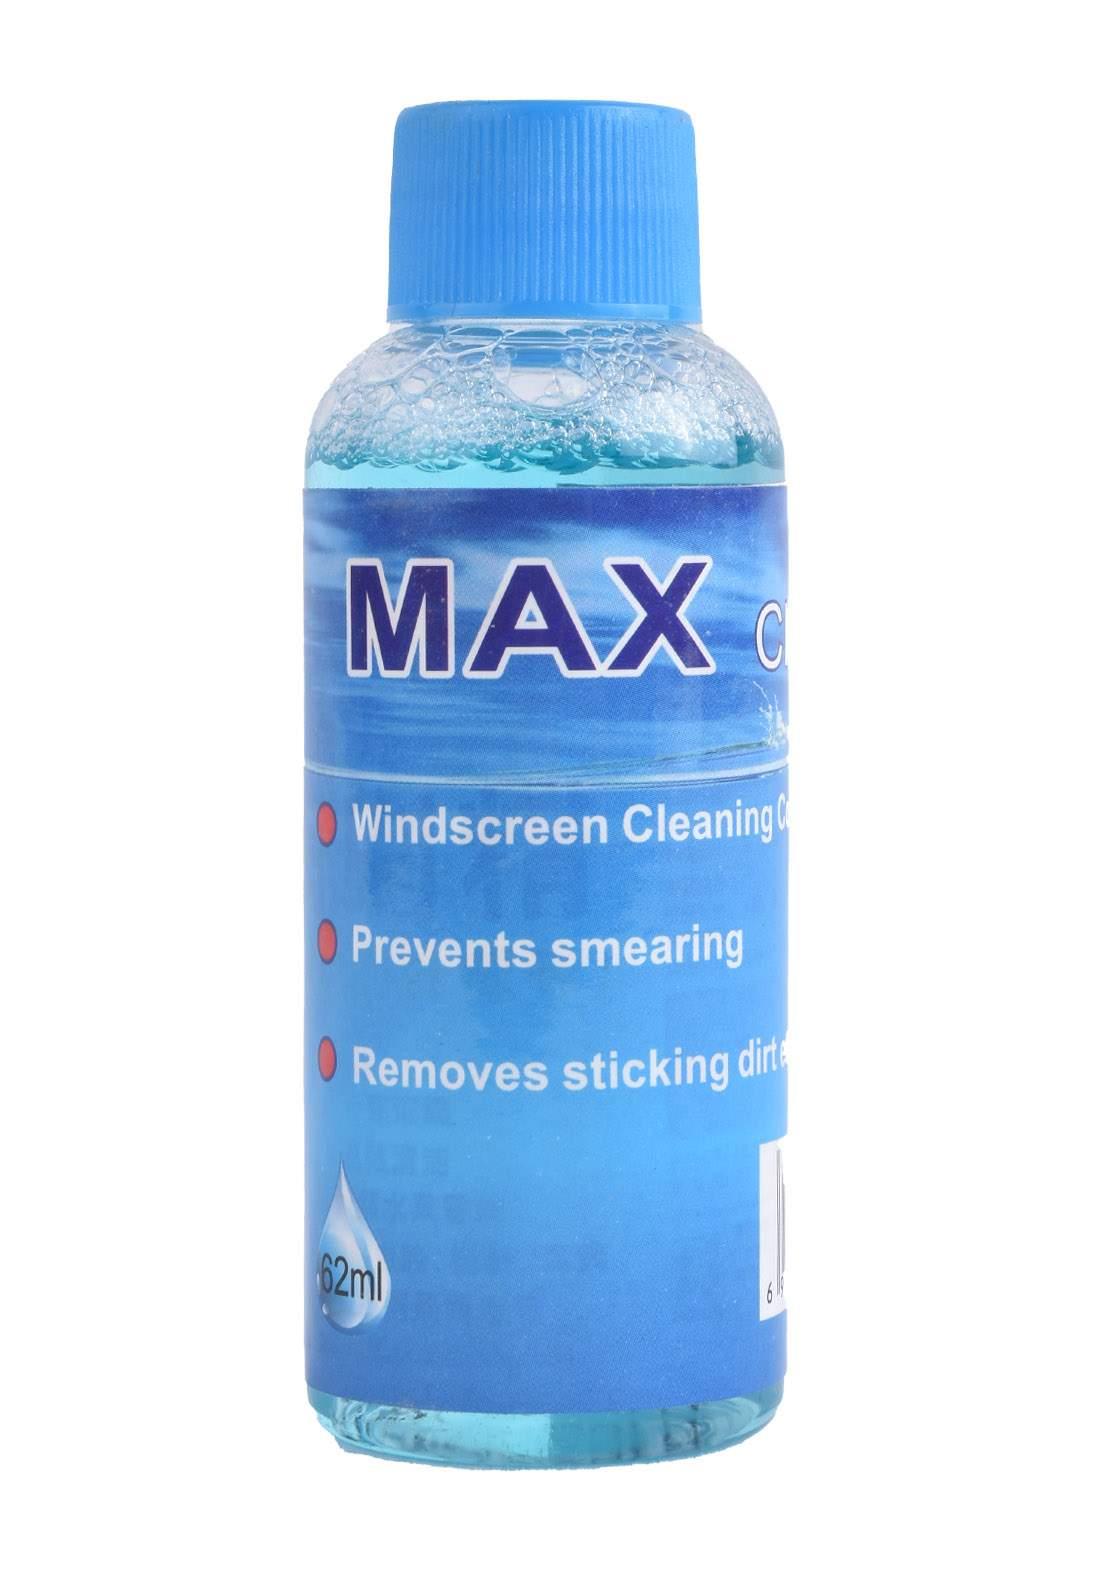 Max Windscreen Cleaning Concentrate 62 ml-Blue منظف ممسحة زجاج السيارة الامامي